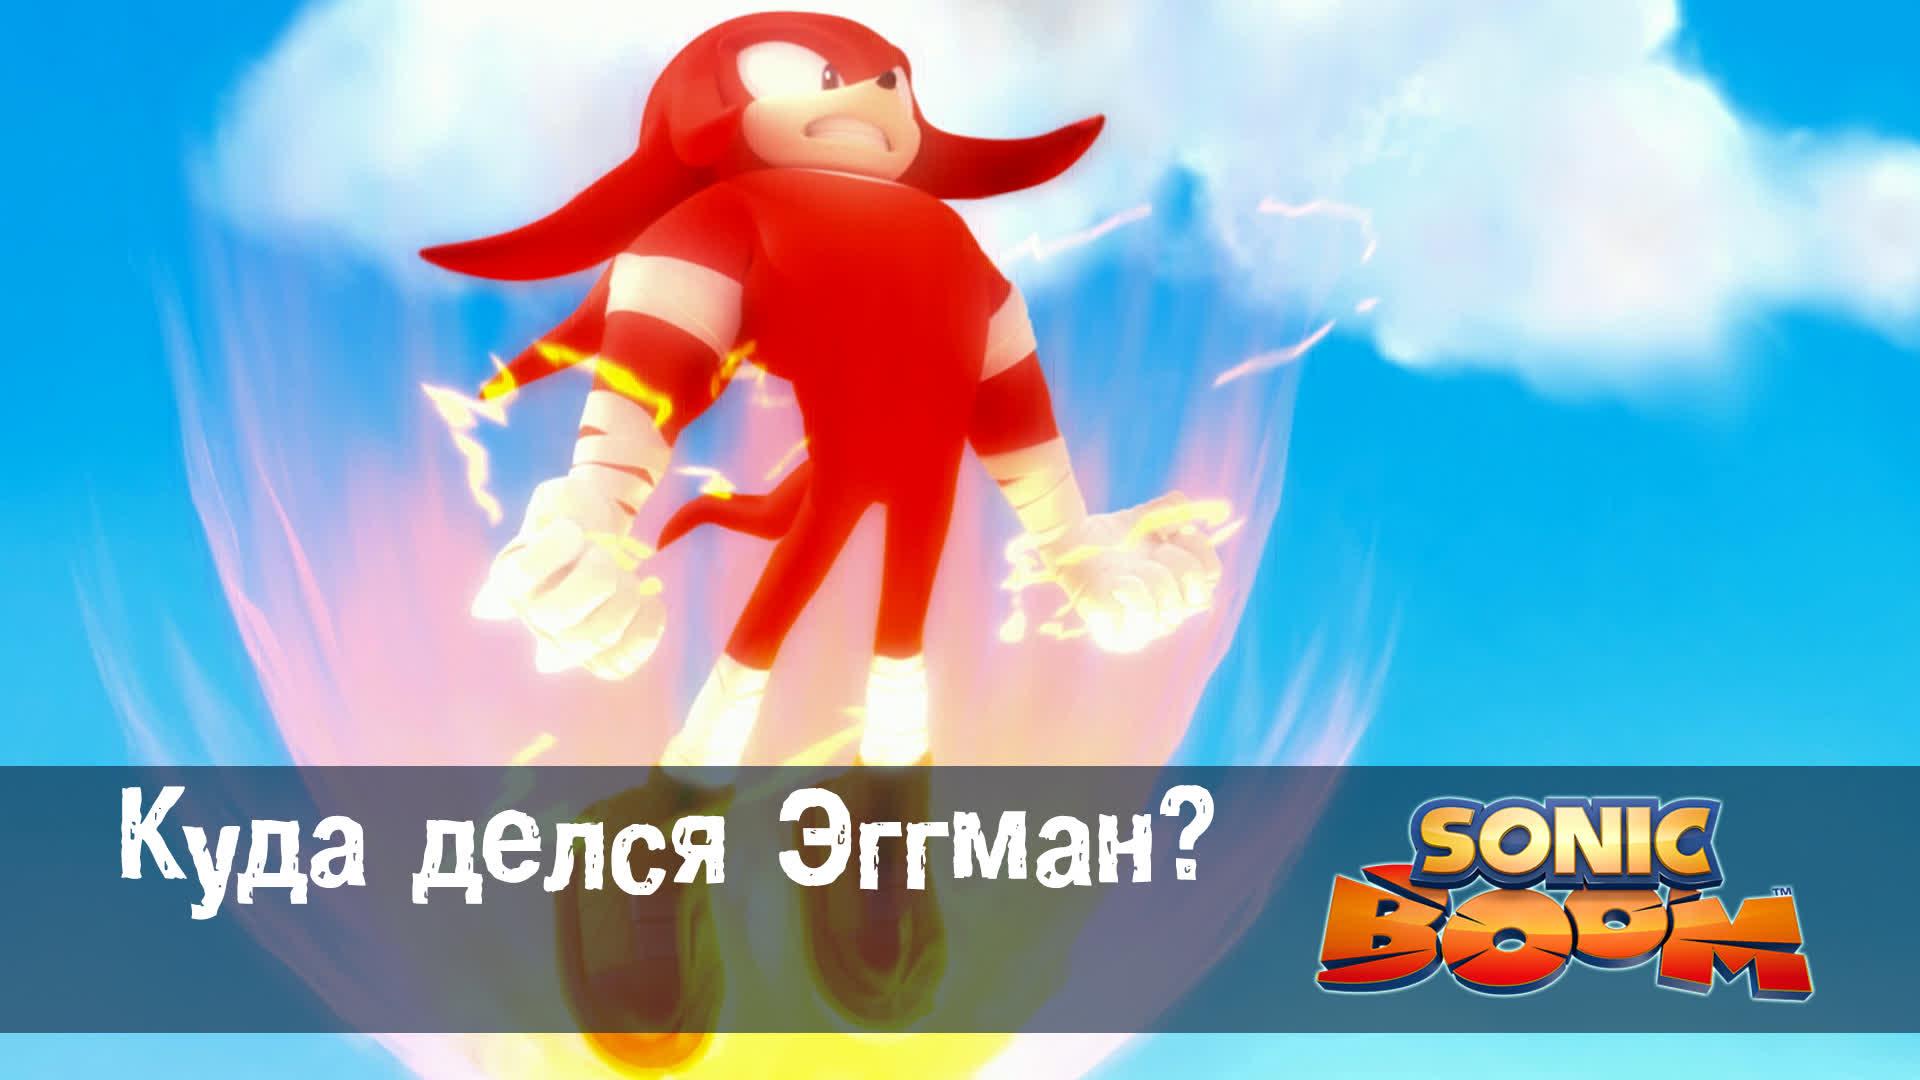 Соник Бум - Серия 10